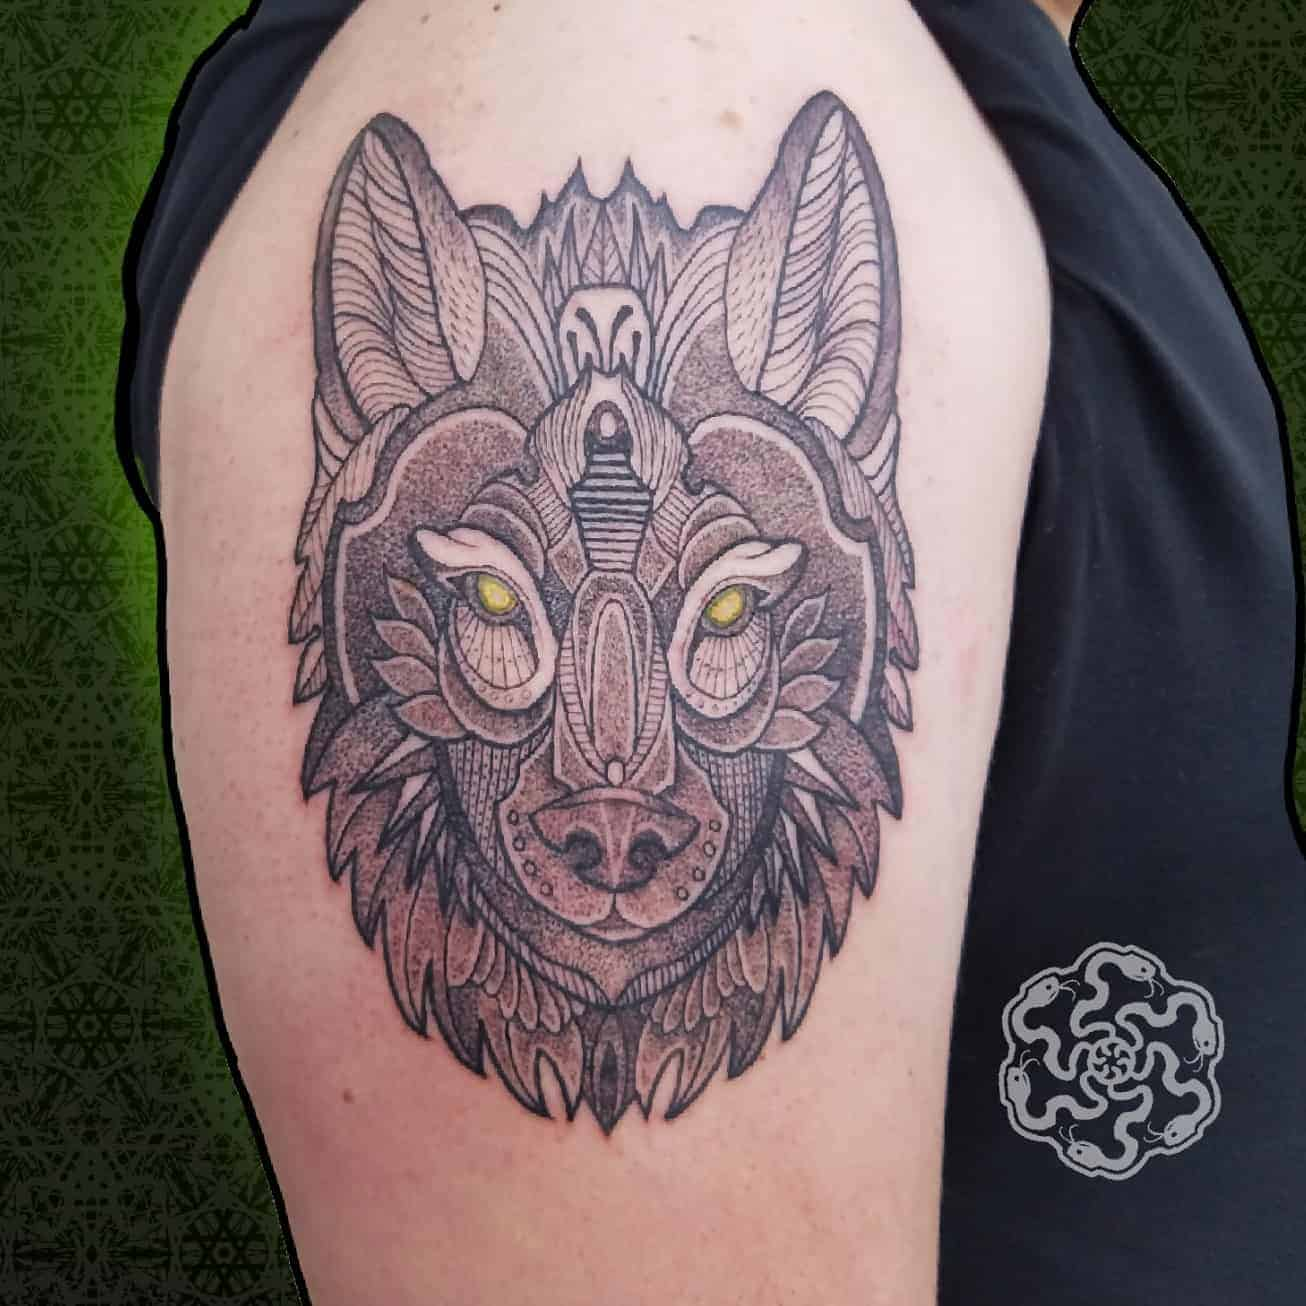 blackwork tattoo of manadala wolf on an upper arm